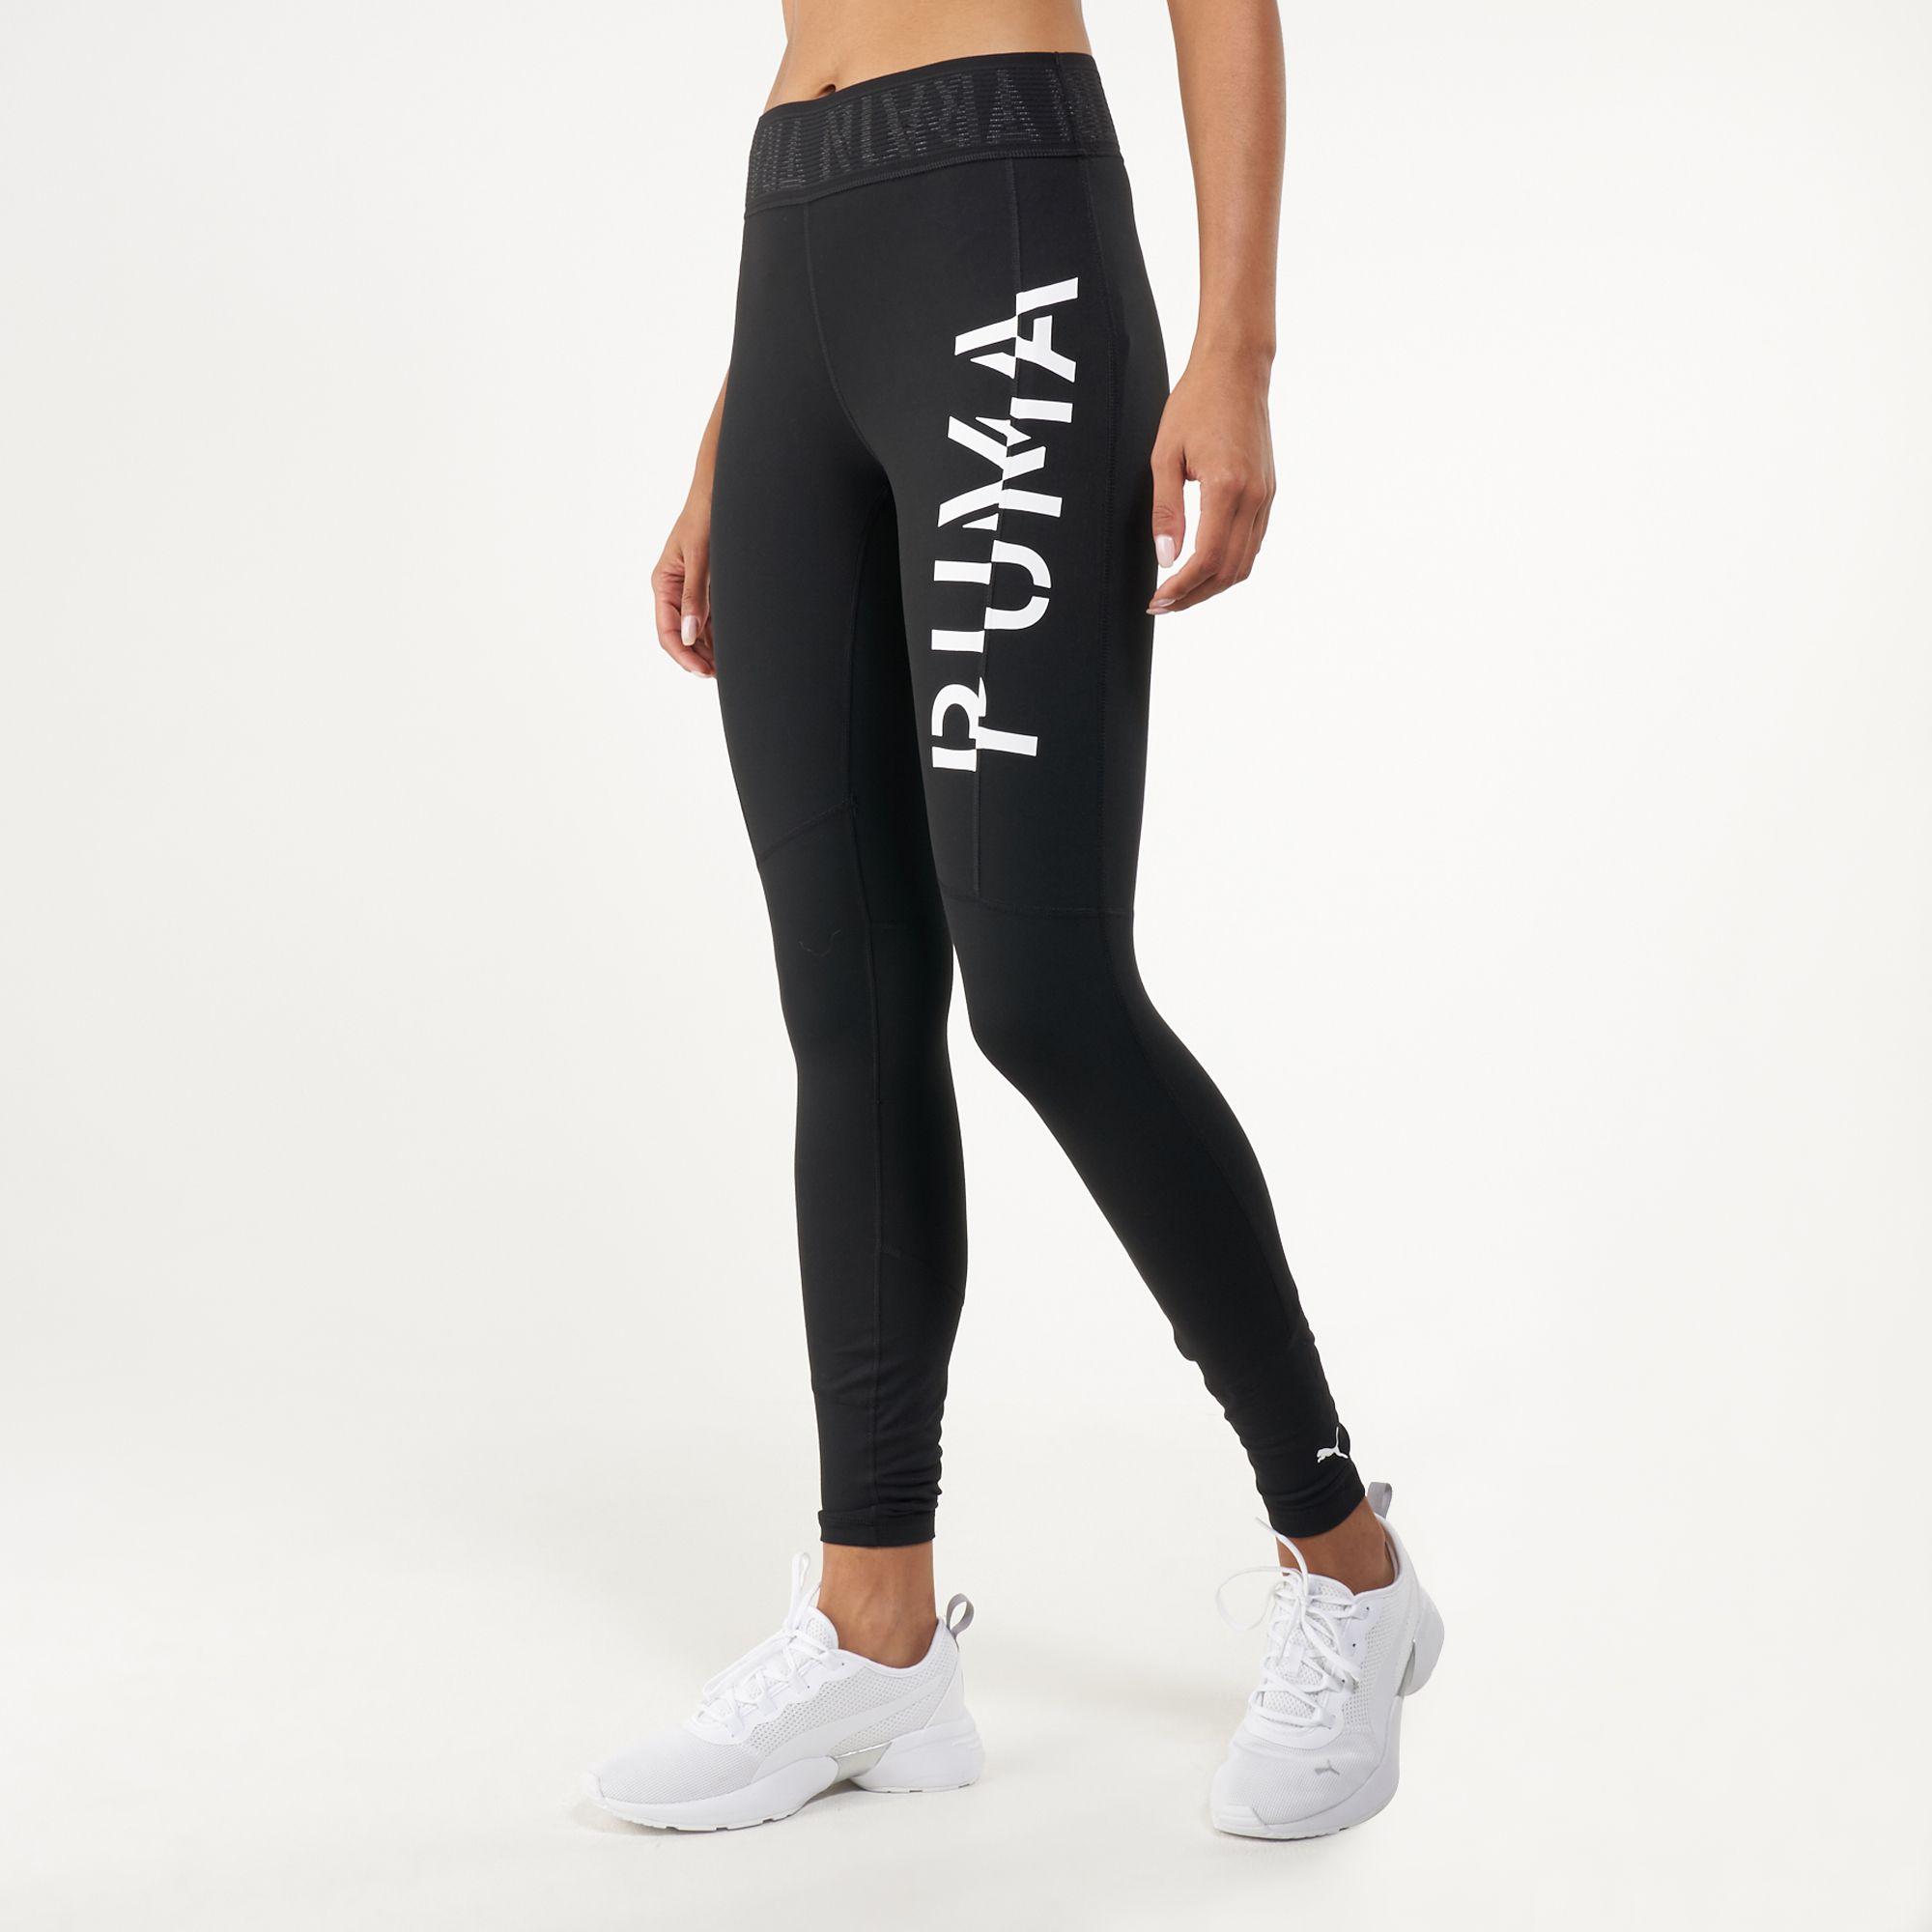 PUMA Women's 7/8 Logo Leggings